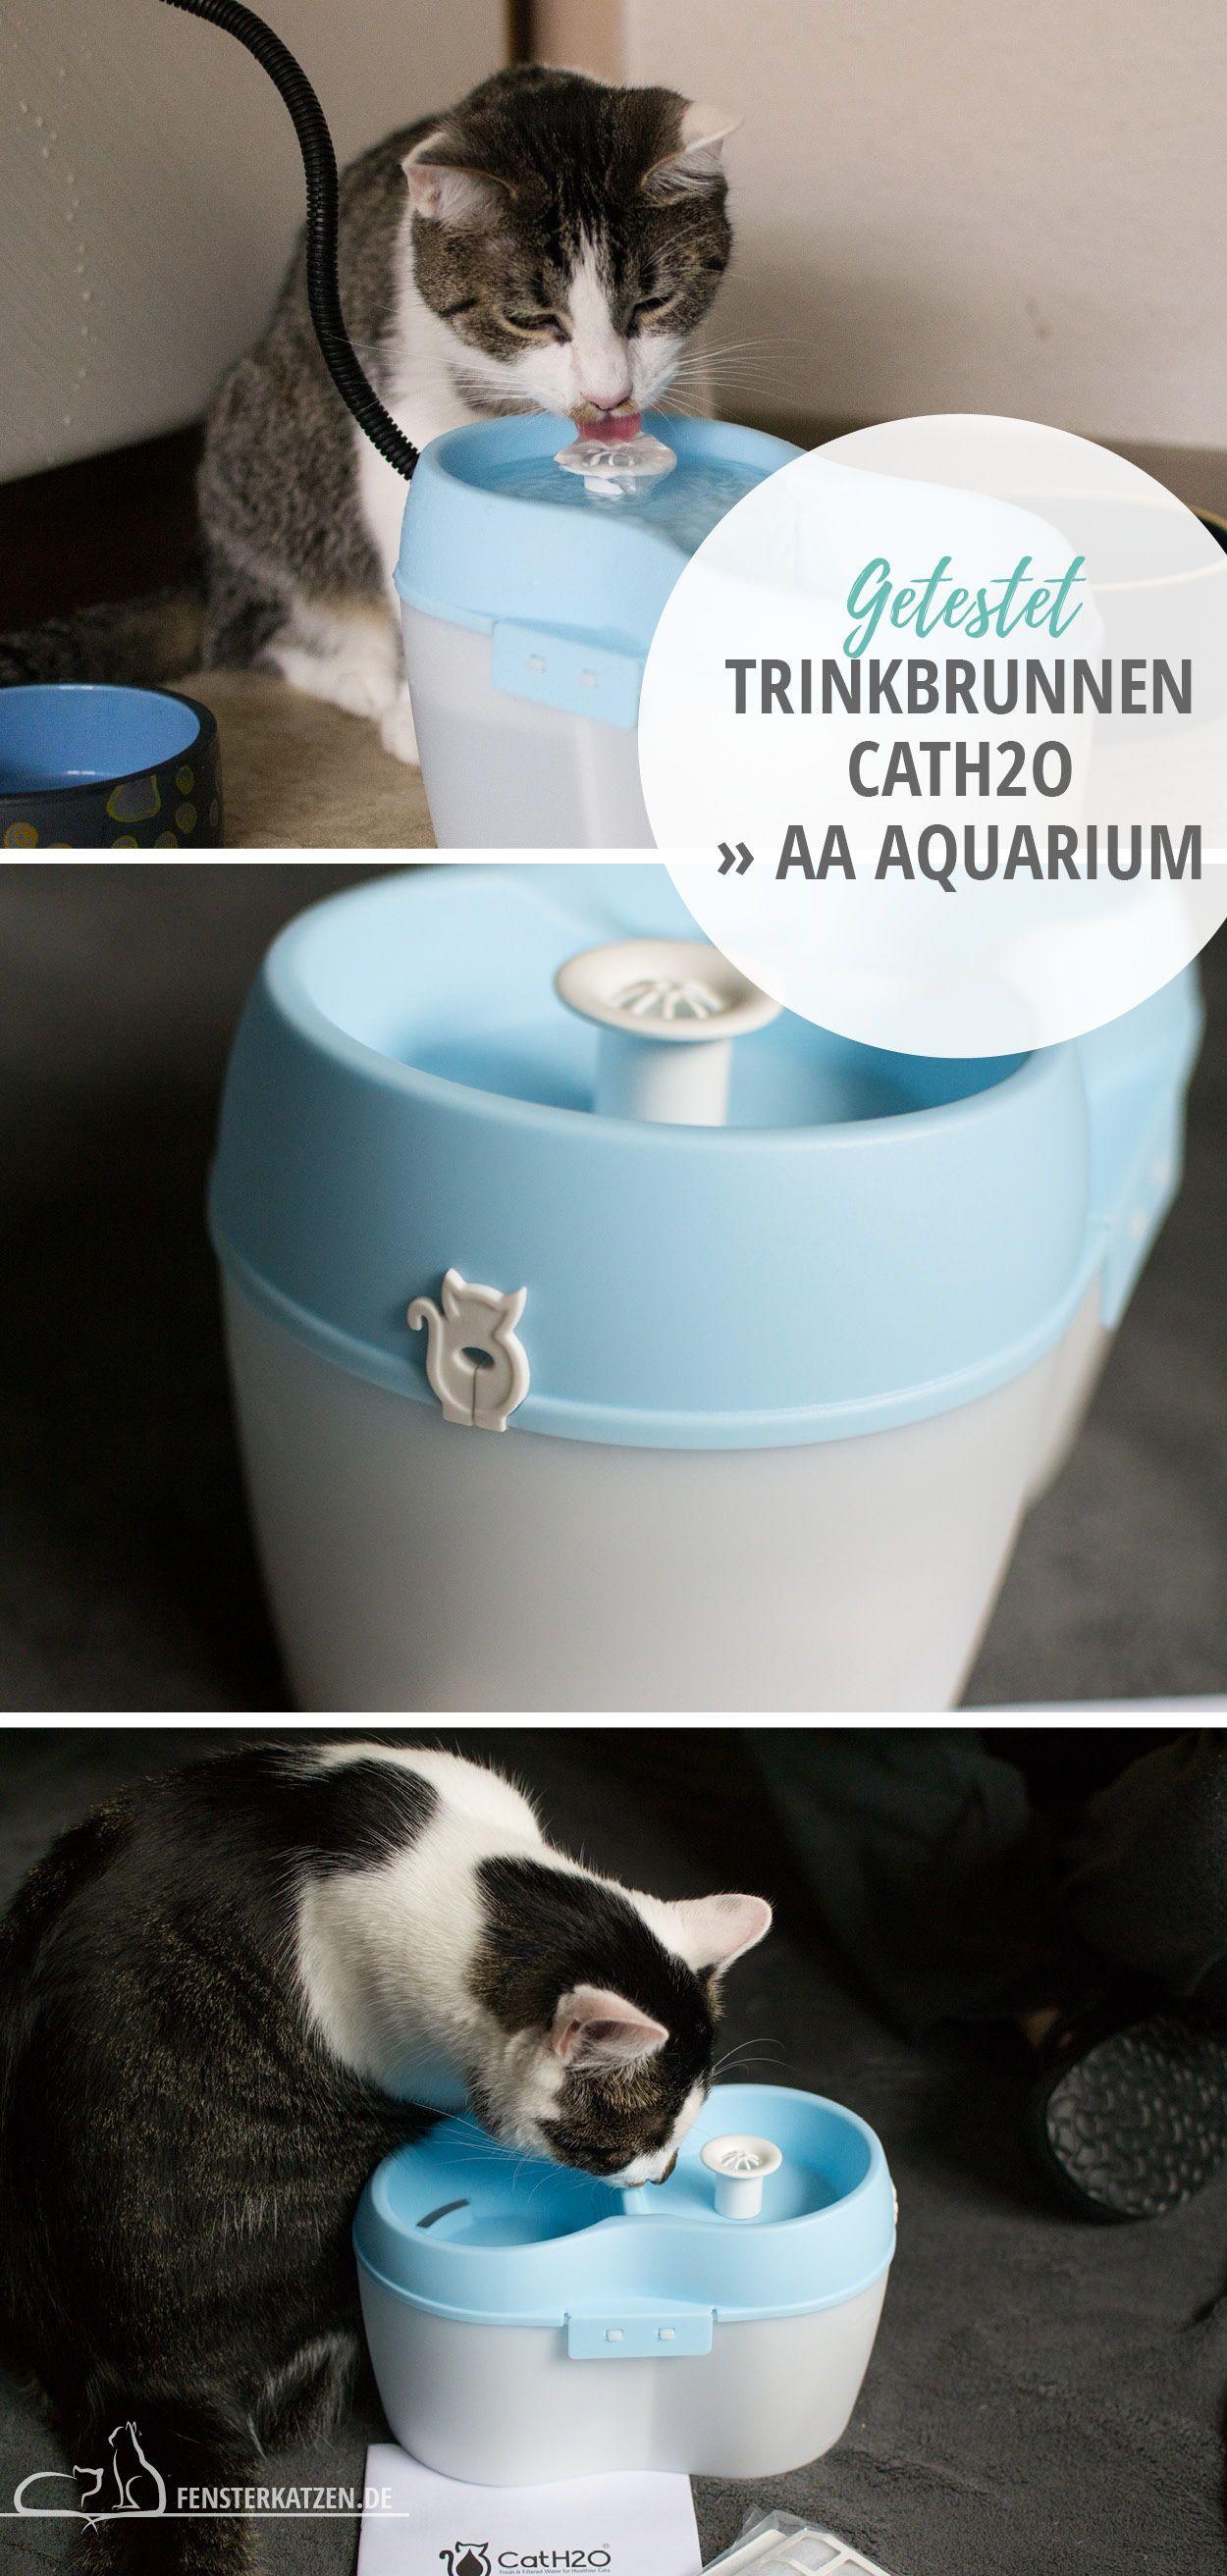 Trinkbrunnen Cath2o Aa Aquarium Getestet Trinkbrunnen Katzenhaltung Katzen